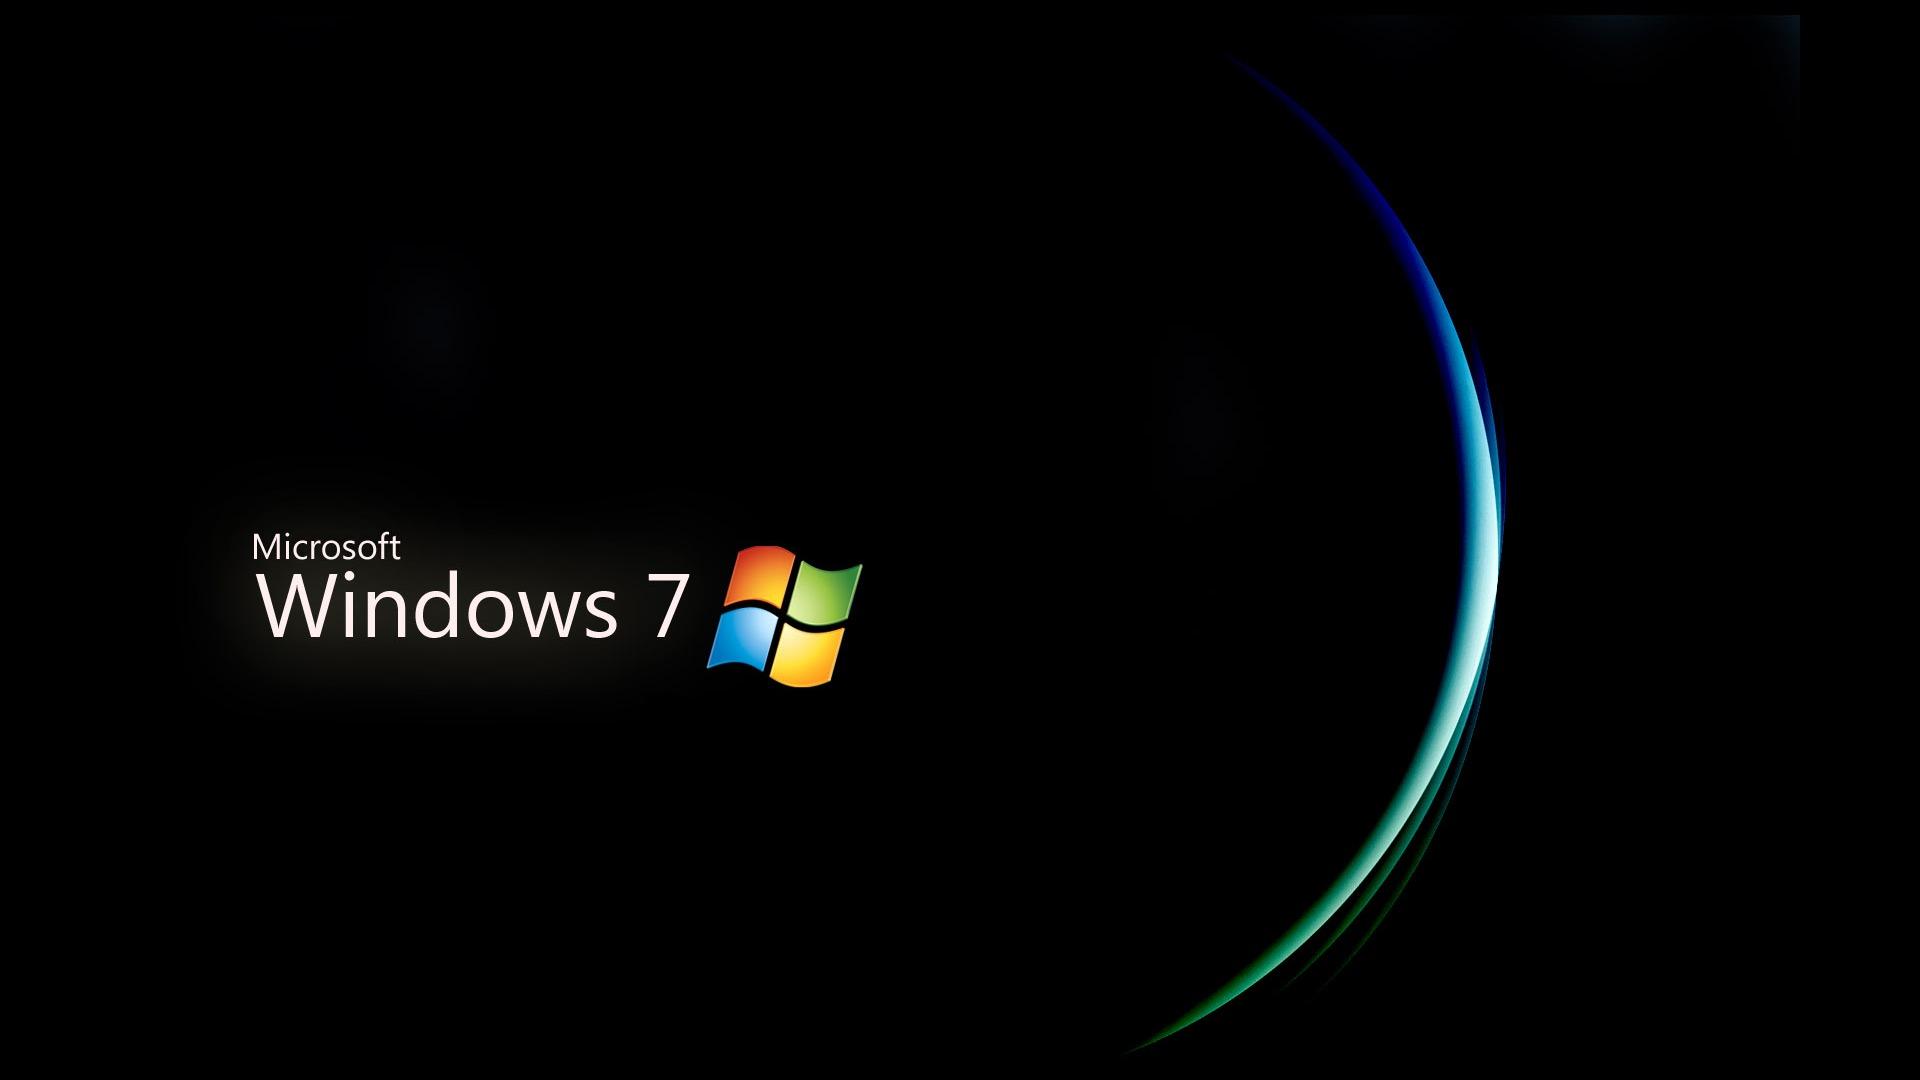 Windows7のテーマの壁紙(2) #4 - 1920x1080.